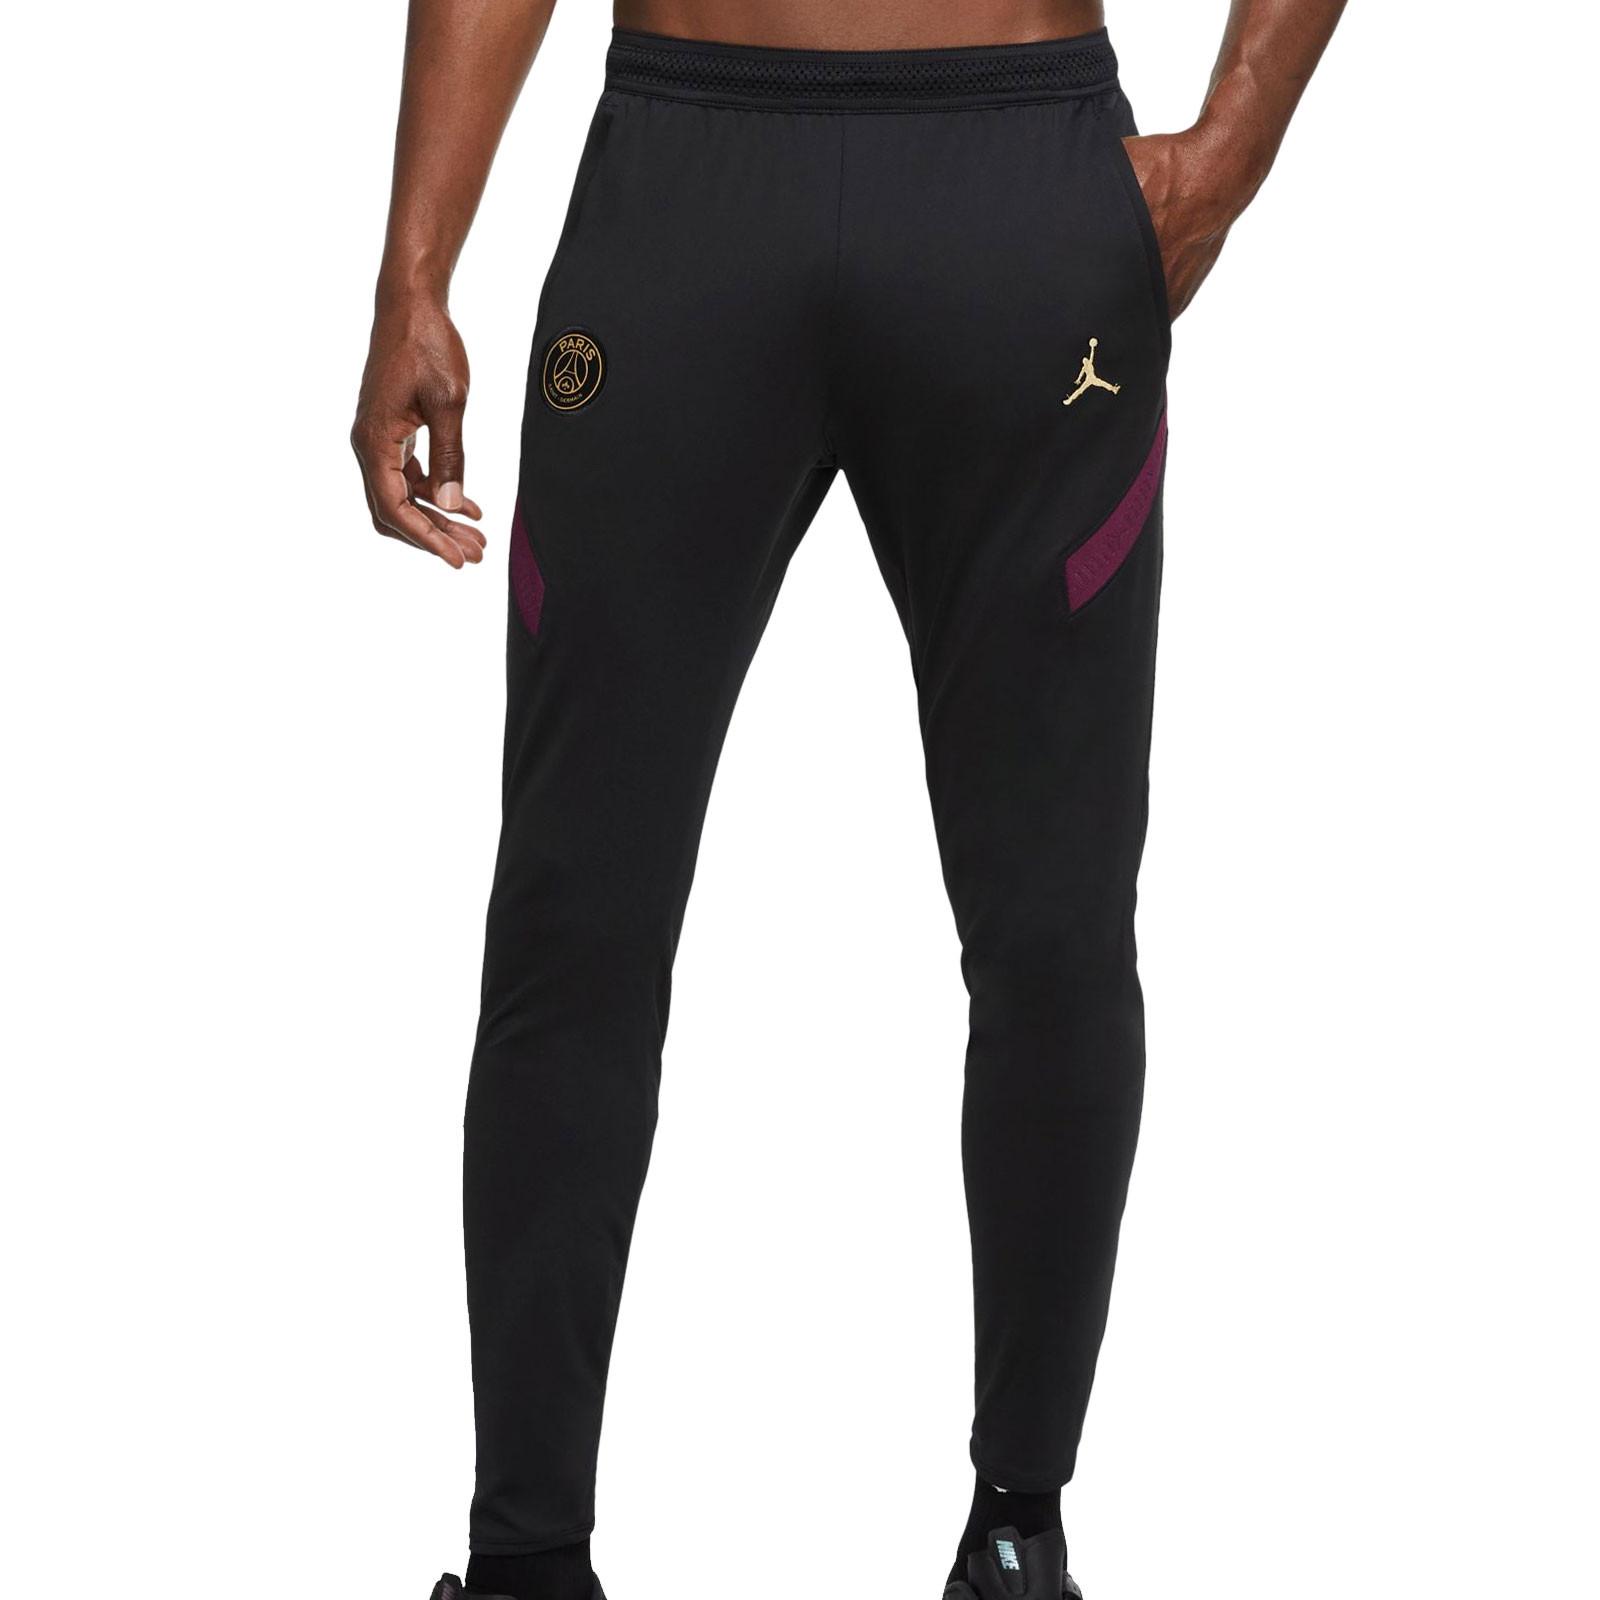 Pantalon Nike Psg Entreno Ucl 2020 2021 Strike Futbolmania